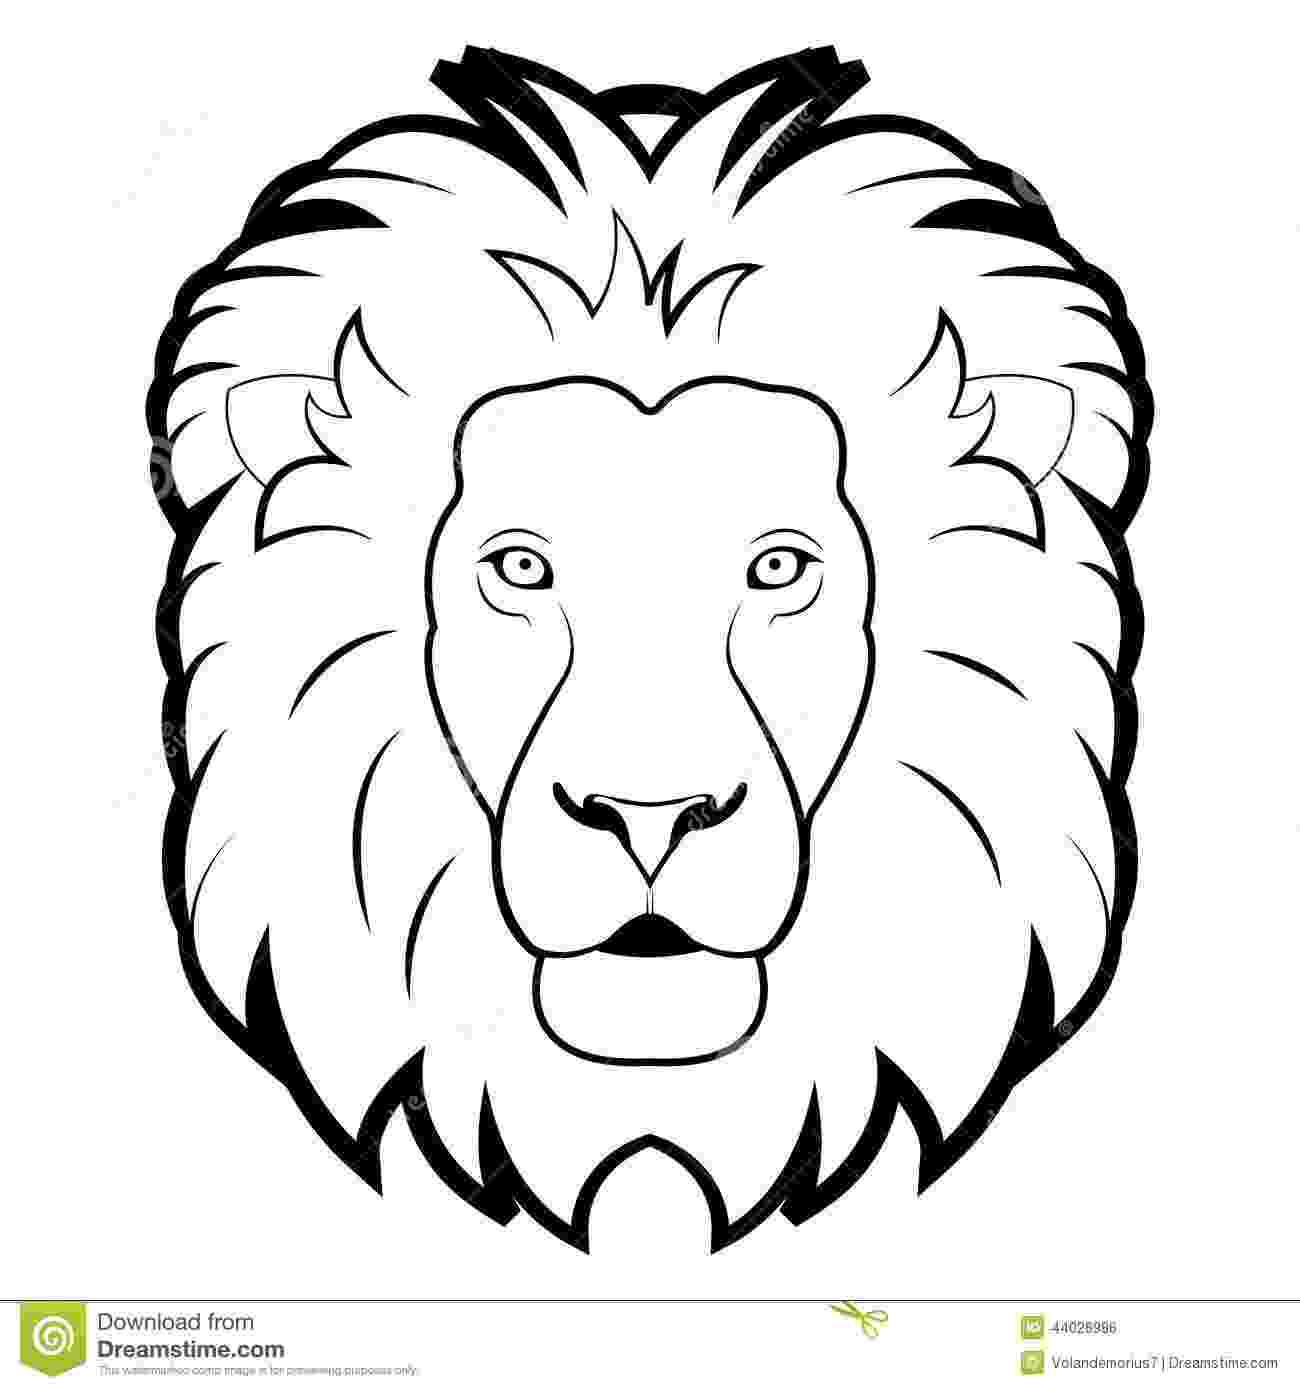 lion cartoon dj behind console stock vector oxygen64 27564125 cartoon lion